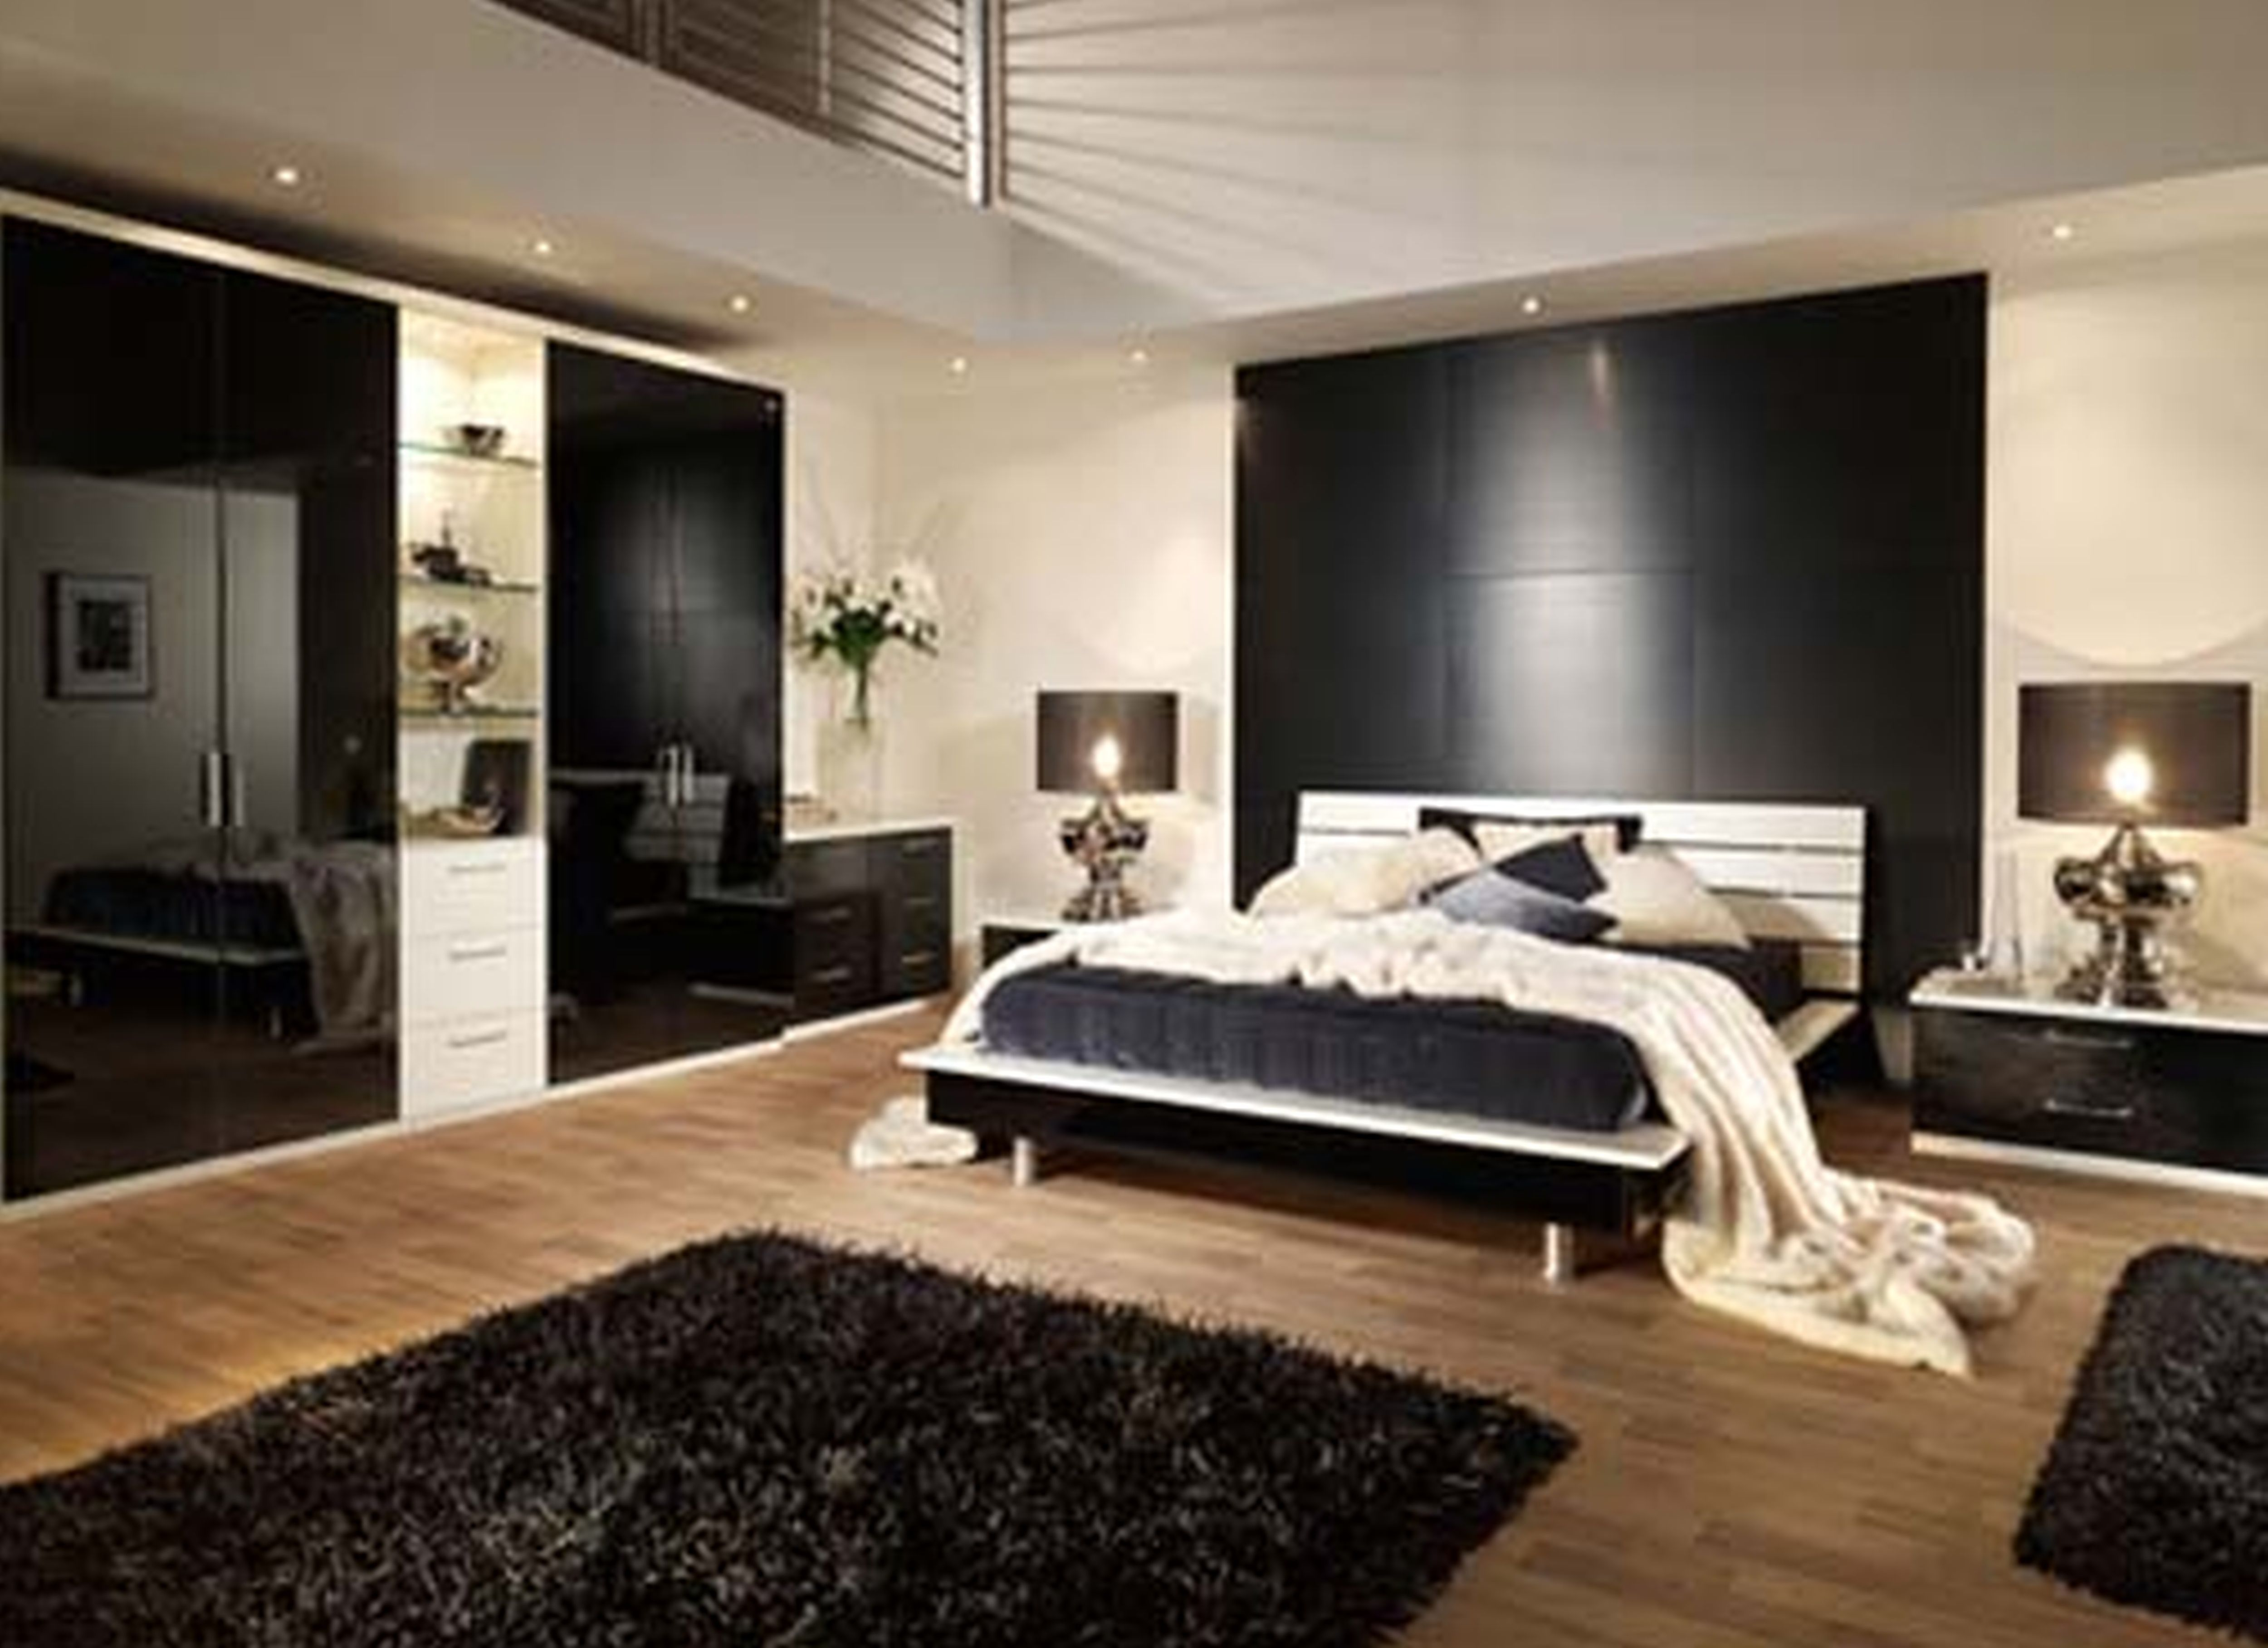 Inspiring Bedroom Design Ideas For Men Decorate